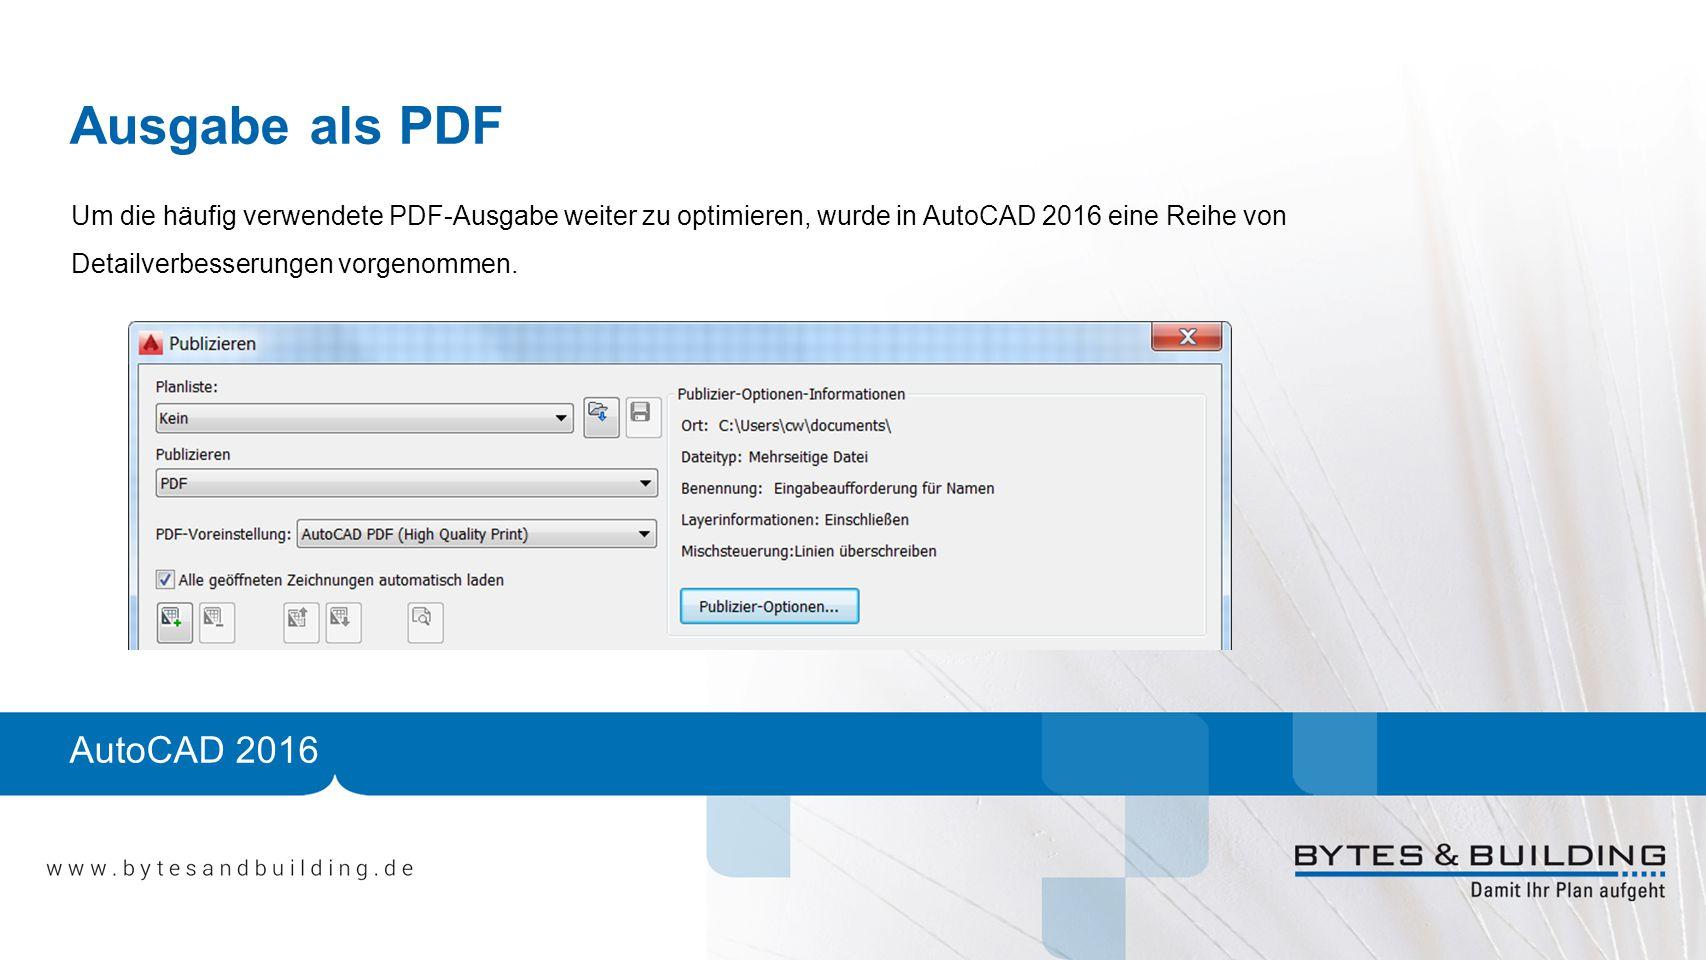 Ausgabe als PDF AutoCAD 2016